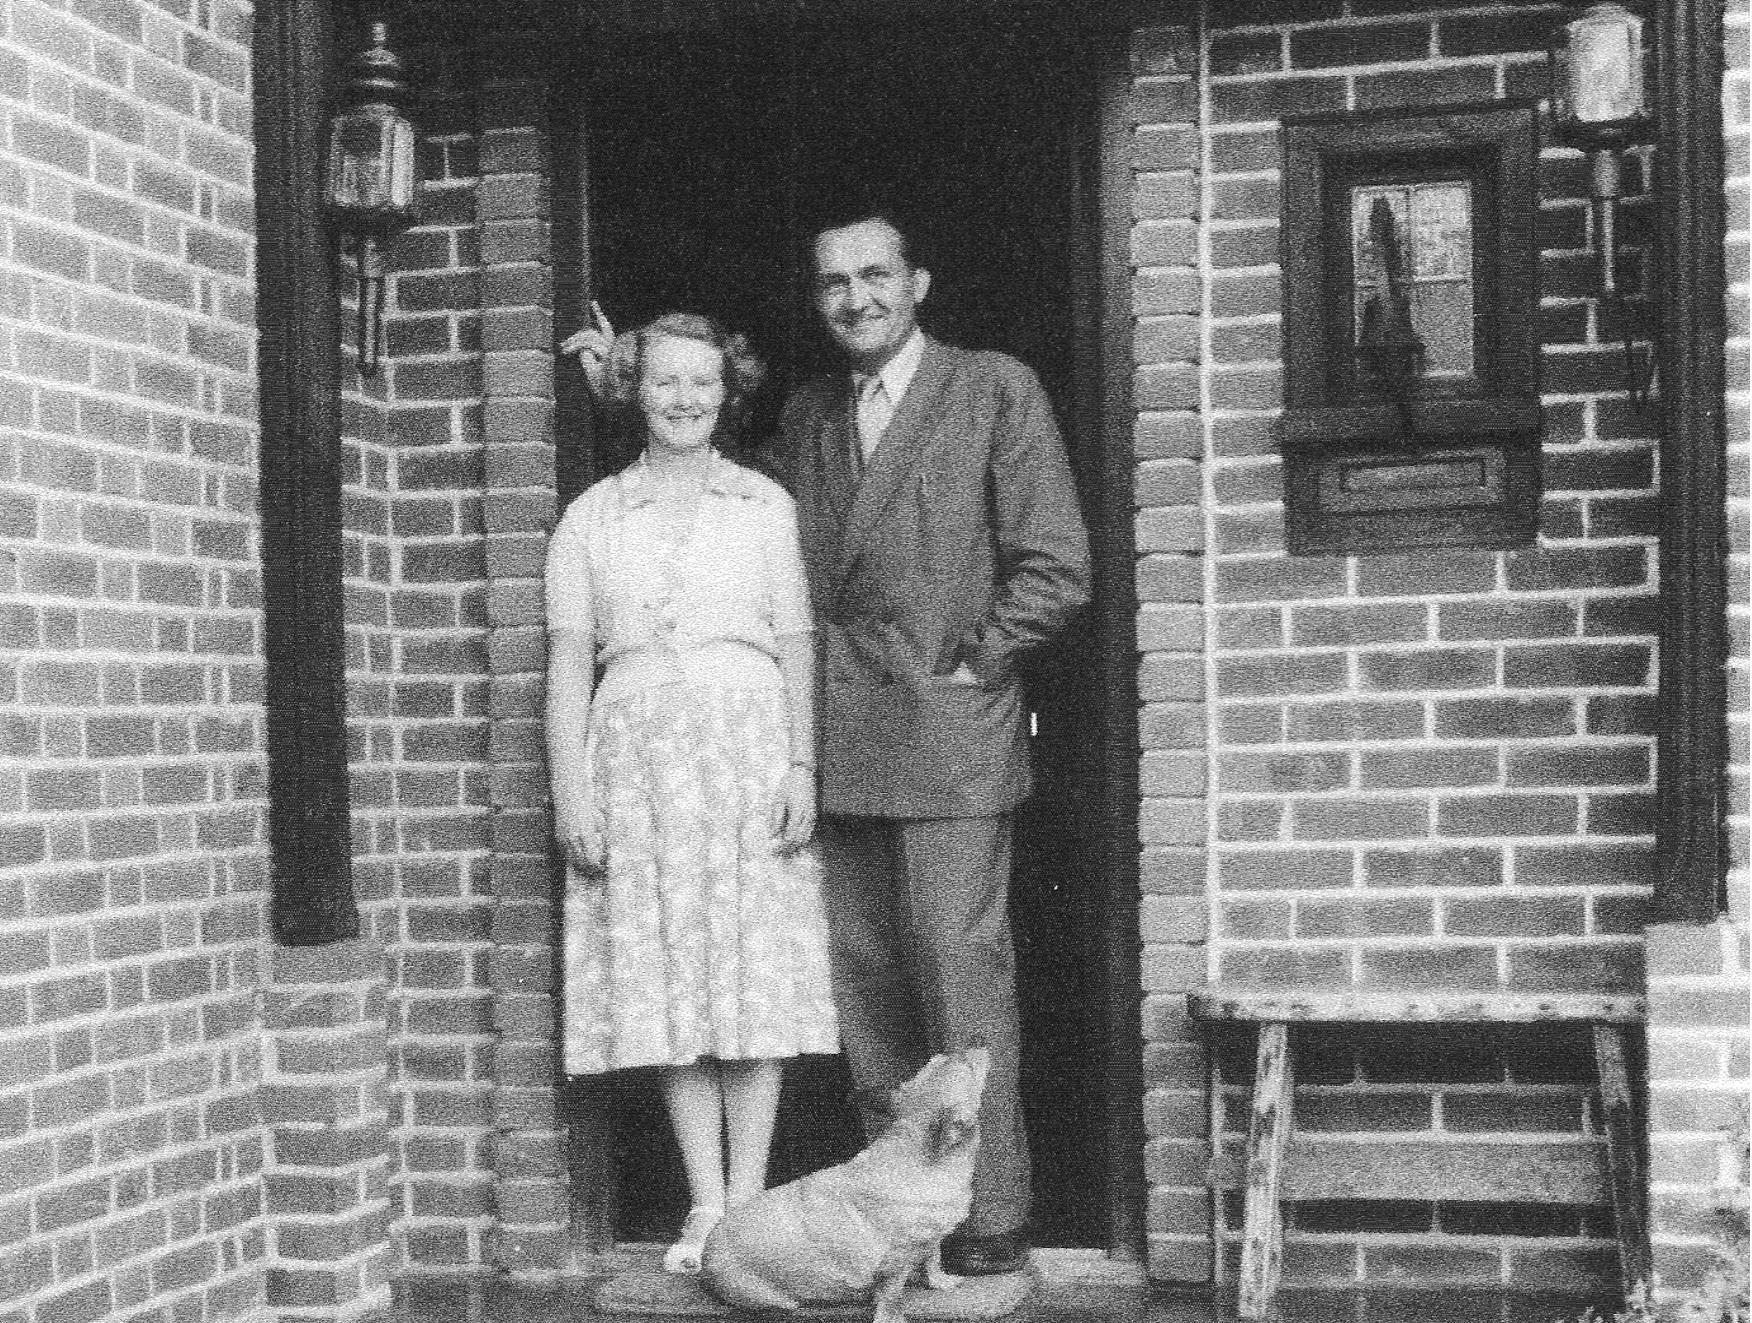 Wolfgang Klinge and wife  - Greyfriars